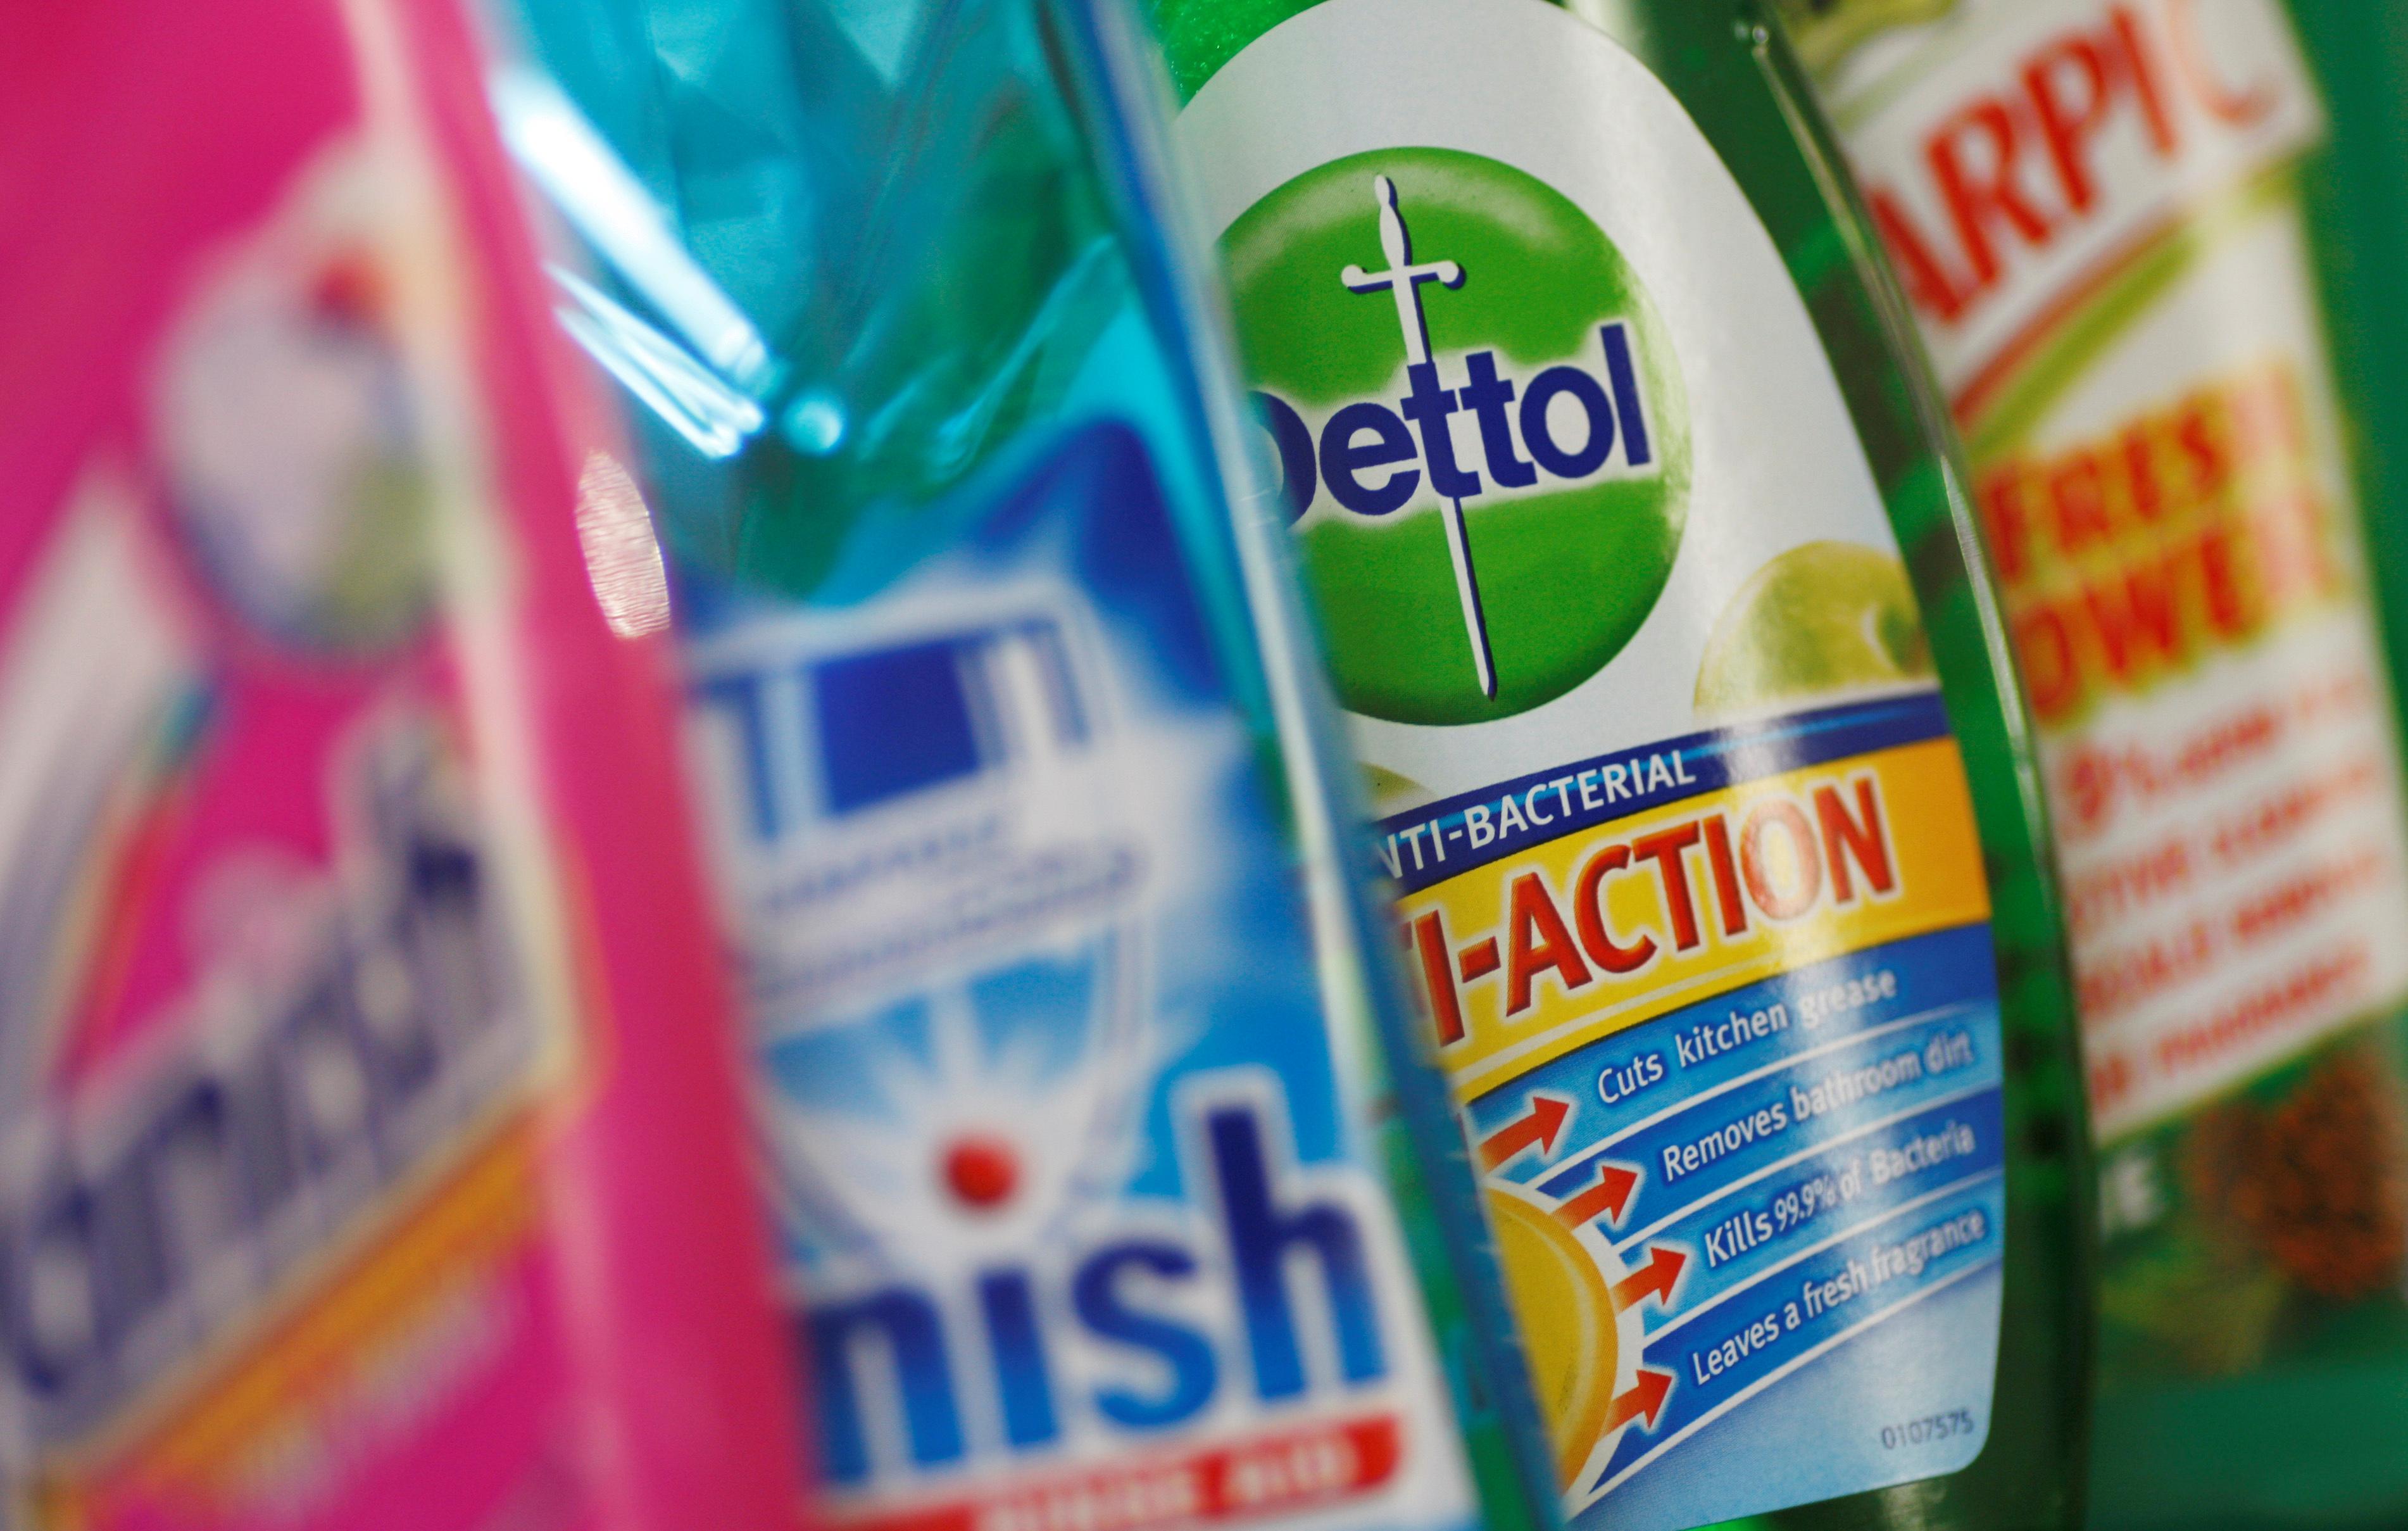 Infant formula growing pains hurt Reckitt Benckiser sales